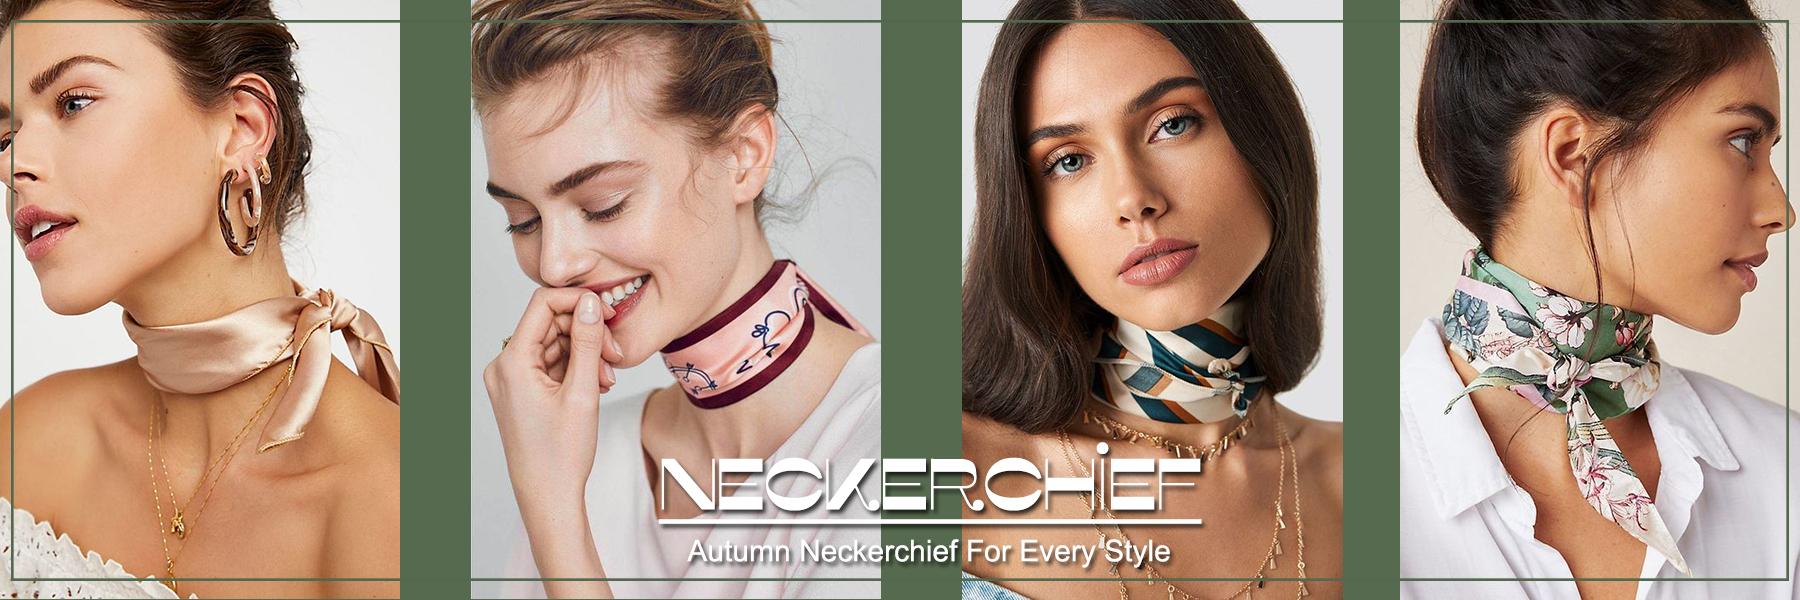 Wholesale Skinny Neckerchief